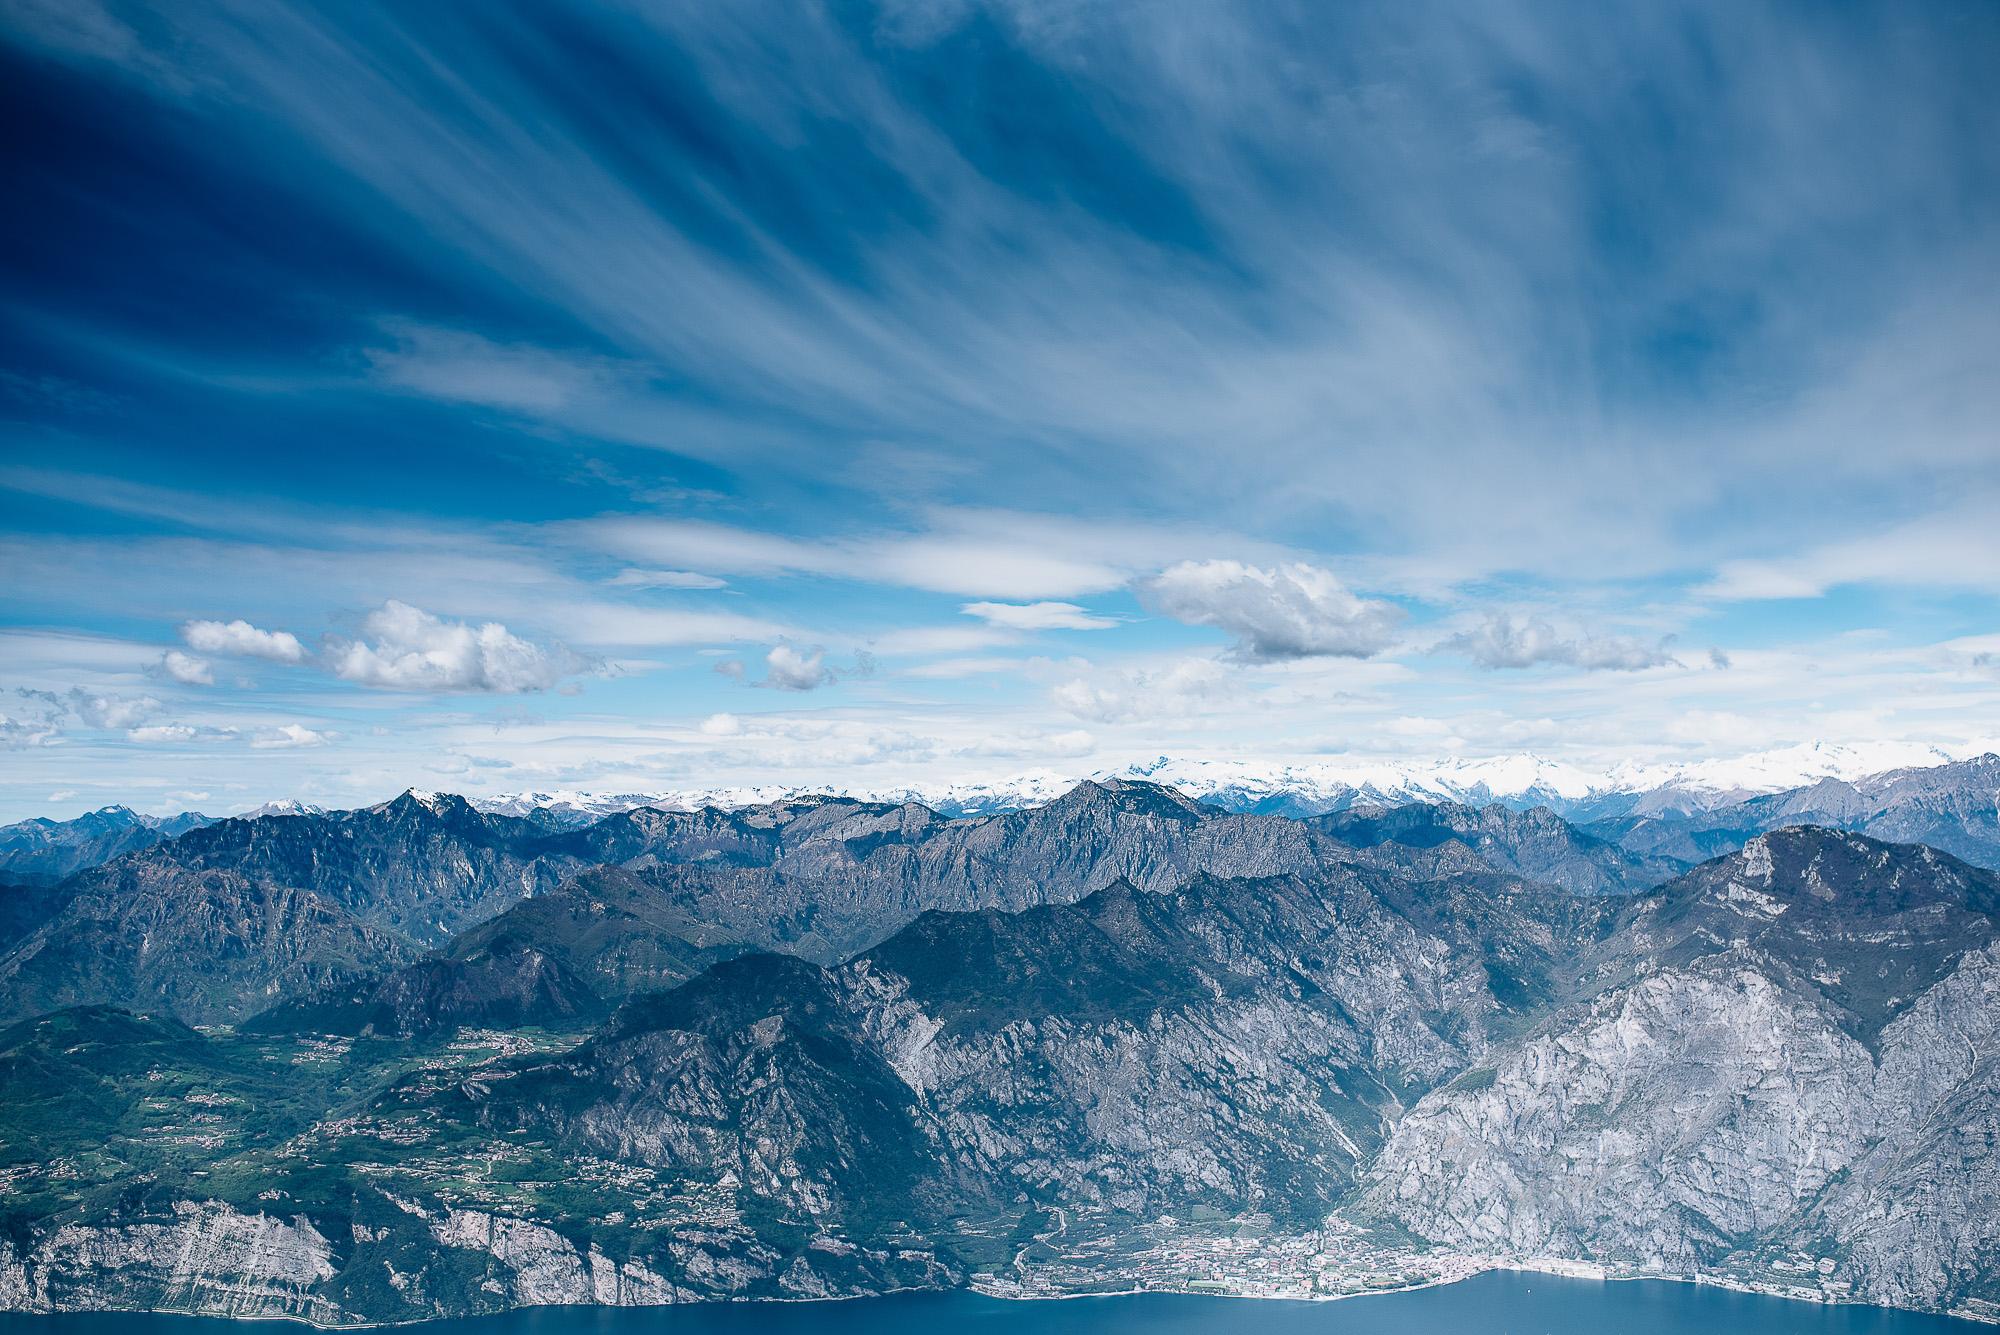 OurBeautifulAdventure-LakeGarda-Italy-Blog-1179.jpg